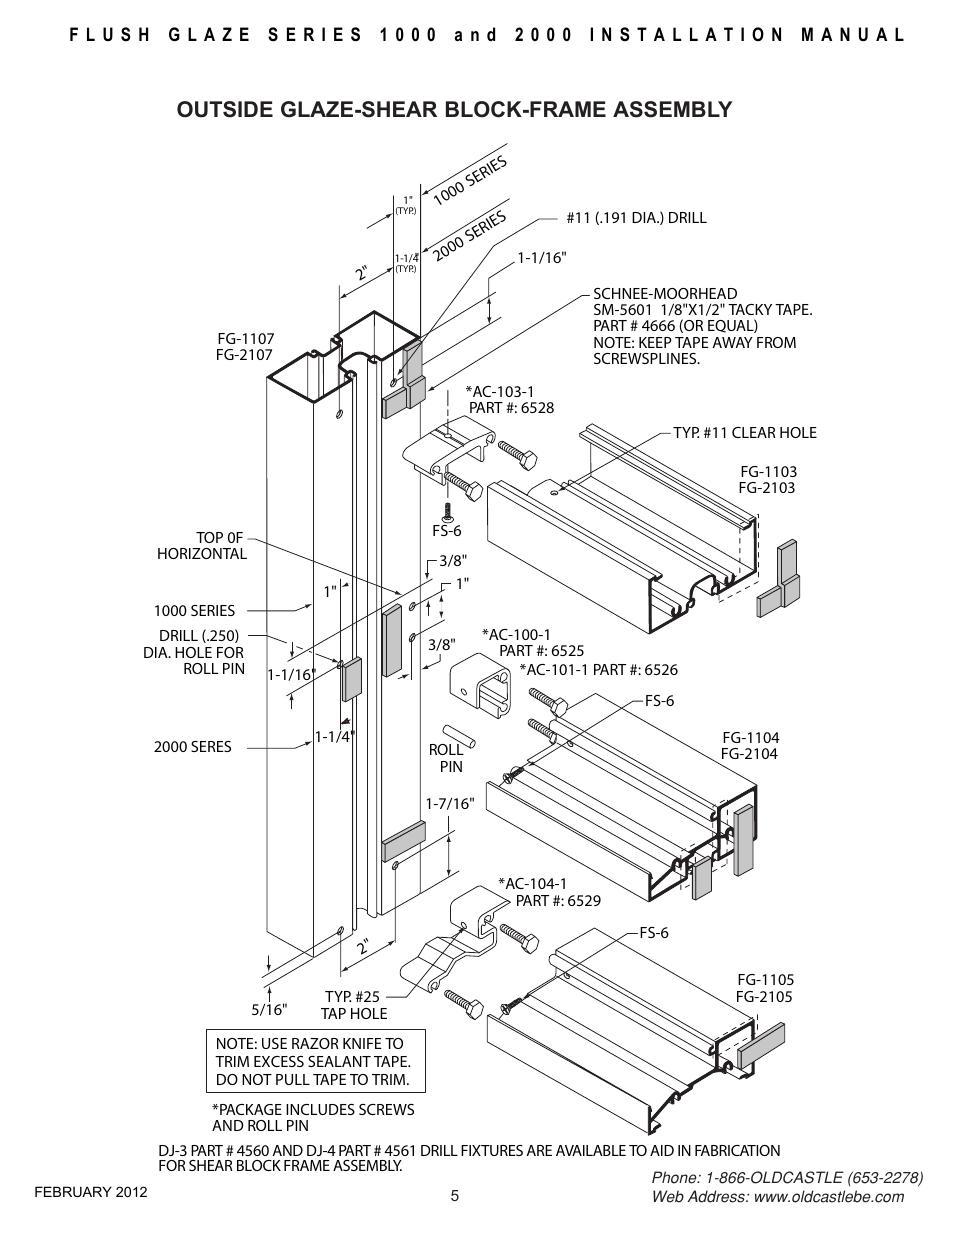 Frame-assy-outside-glaze, Outside glaze-shear block-frame